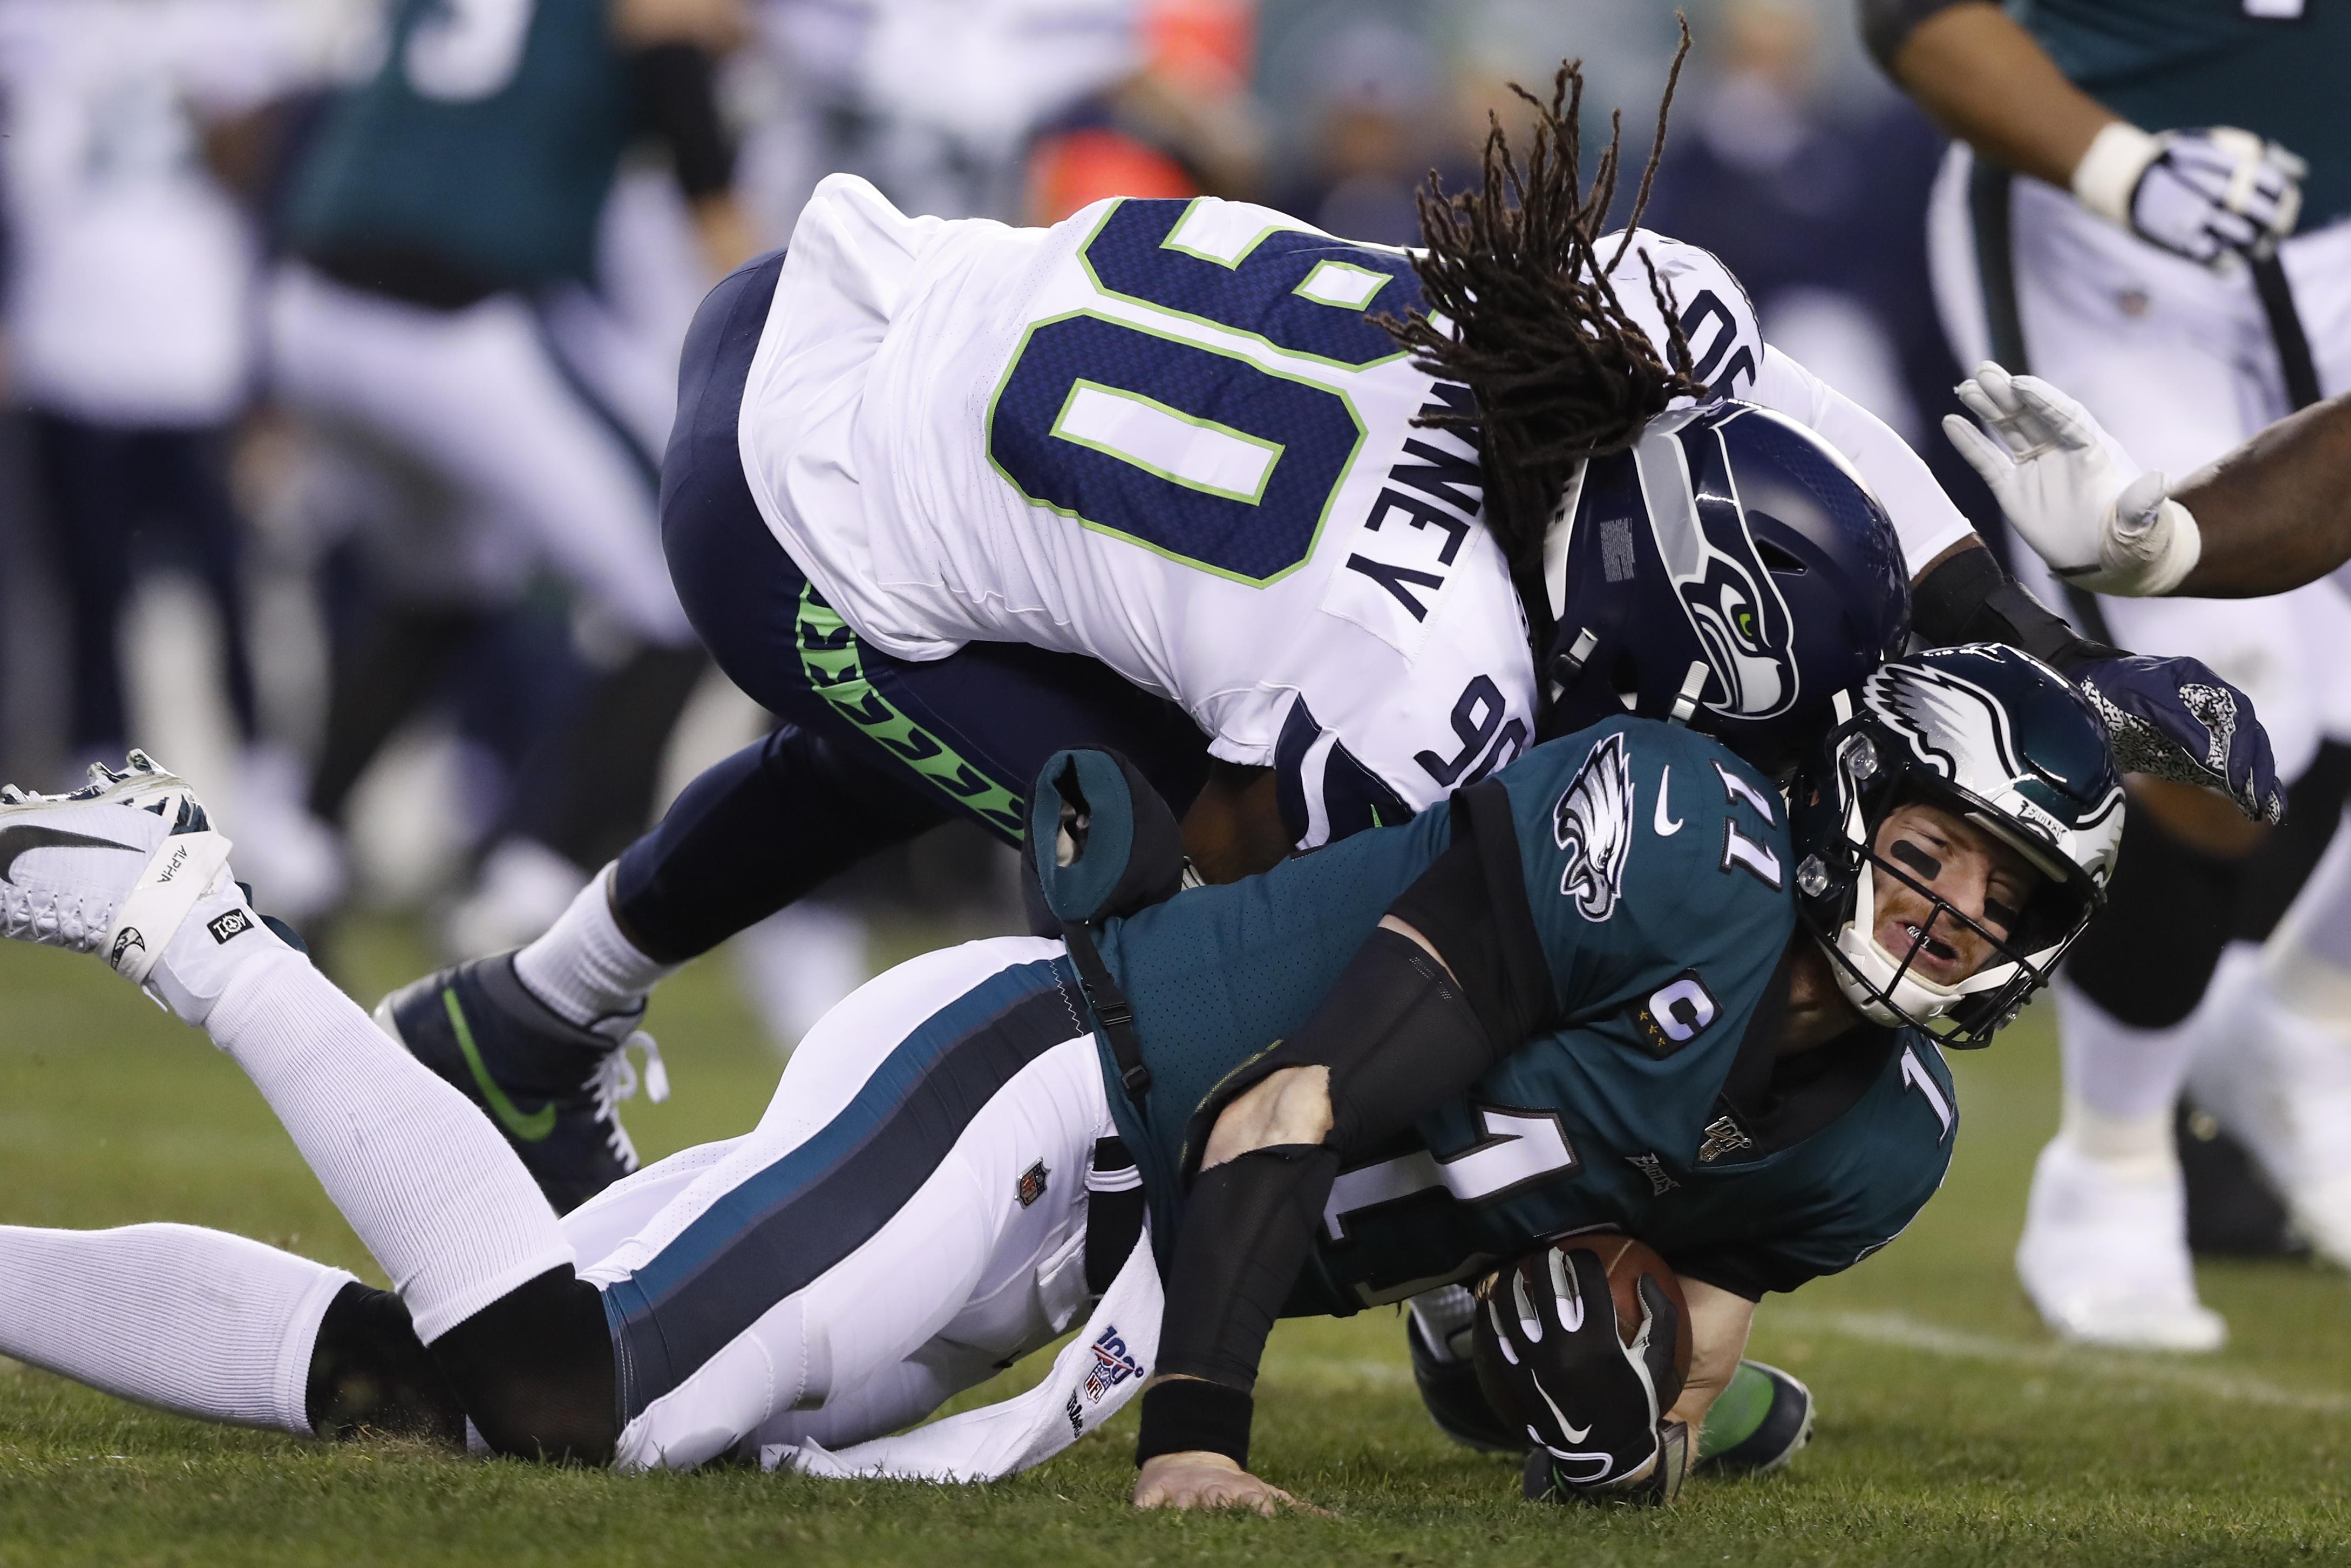 Seattle Seahawks' Jadeveon Clowney (90) hits Philadelphia Eagles' Carson Wentz (11) during the first half of an NFL wild-card playoff football game in Philadelphia on Jan. 5, 2020.